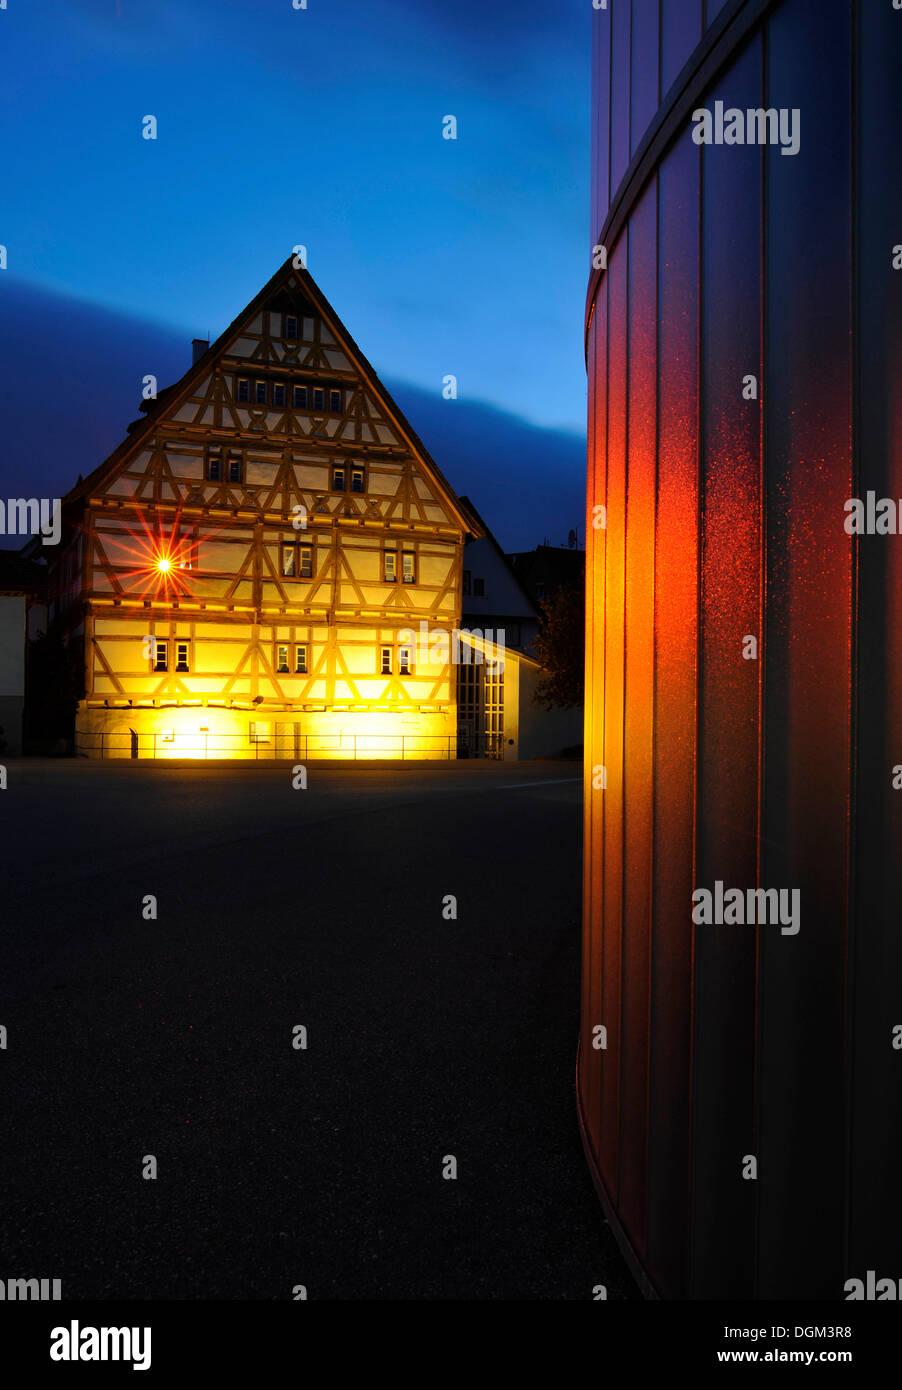 Waiblingen Leuchtet, Beleuchtung, Museum, Galerie Stihl, historische Altstadt, Fachwerk Häuser, Waiblingen Stockbild